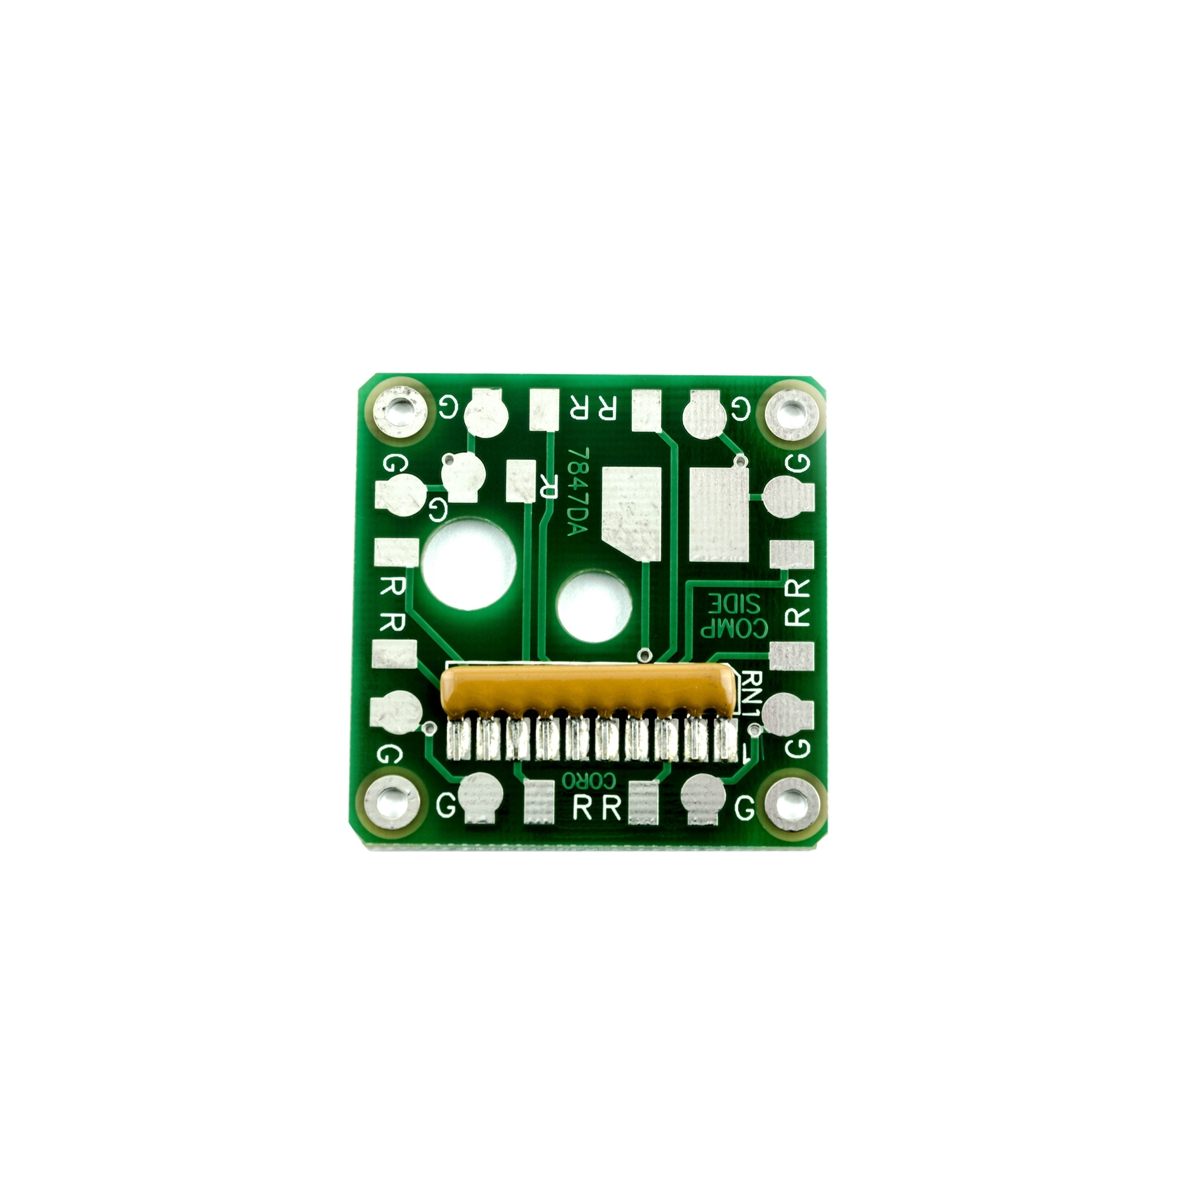 GE Corometrics Nautilus 5700HAX 5700LAX Ultrasound Transducer Ultrasound Circuit Board